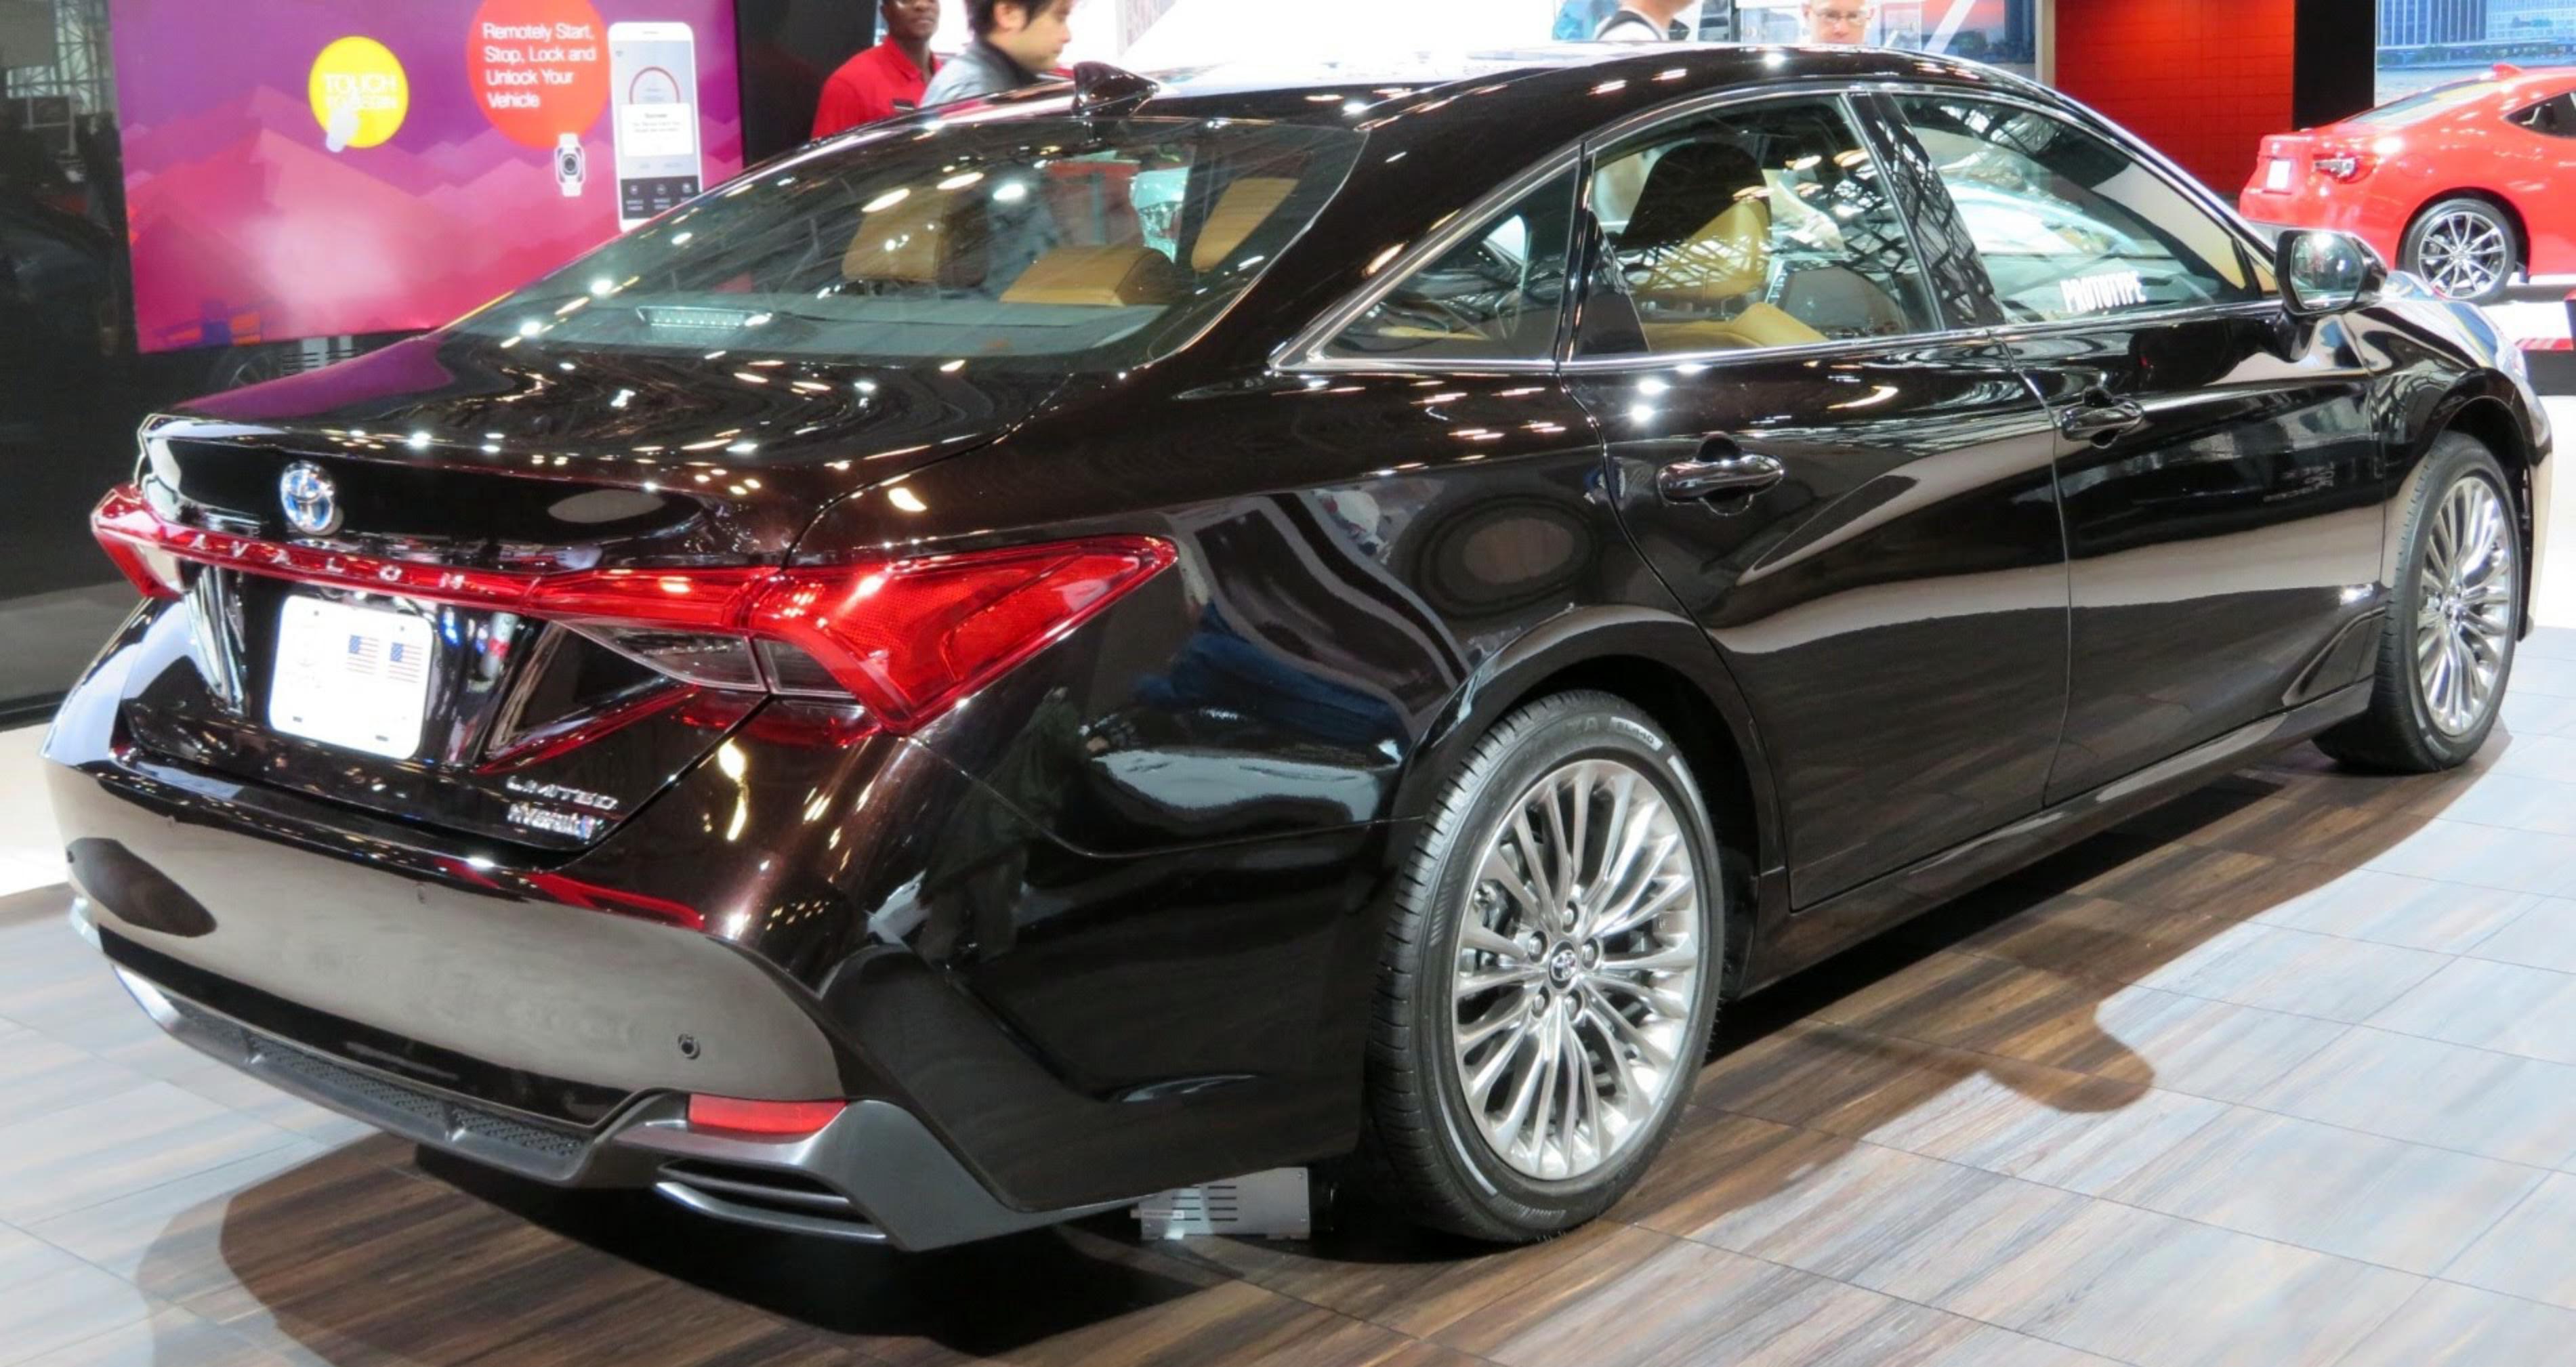 Datei 2019 Toyota Avalon Hybrid Limited Rear 4 2 18 Jpg Wikipedia